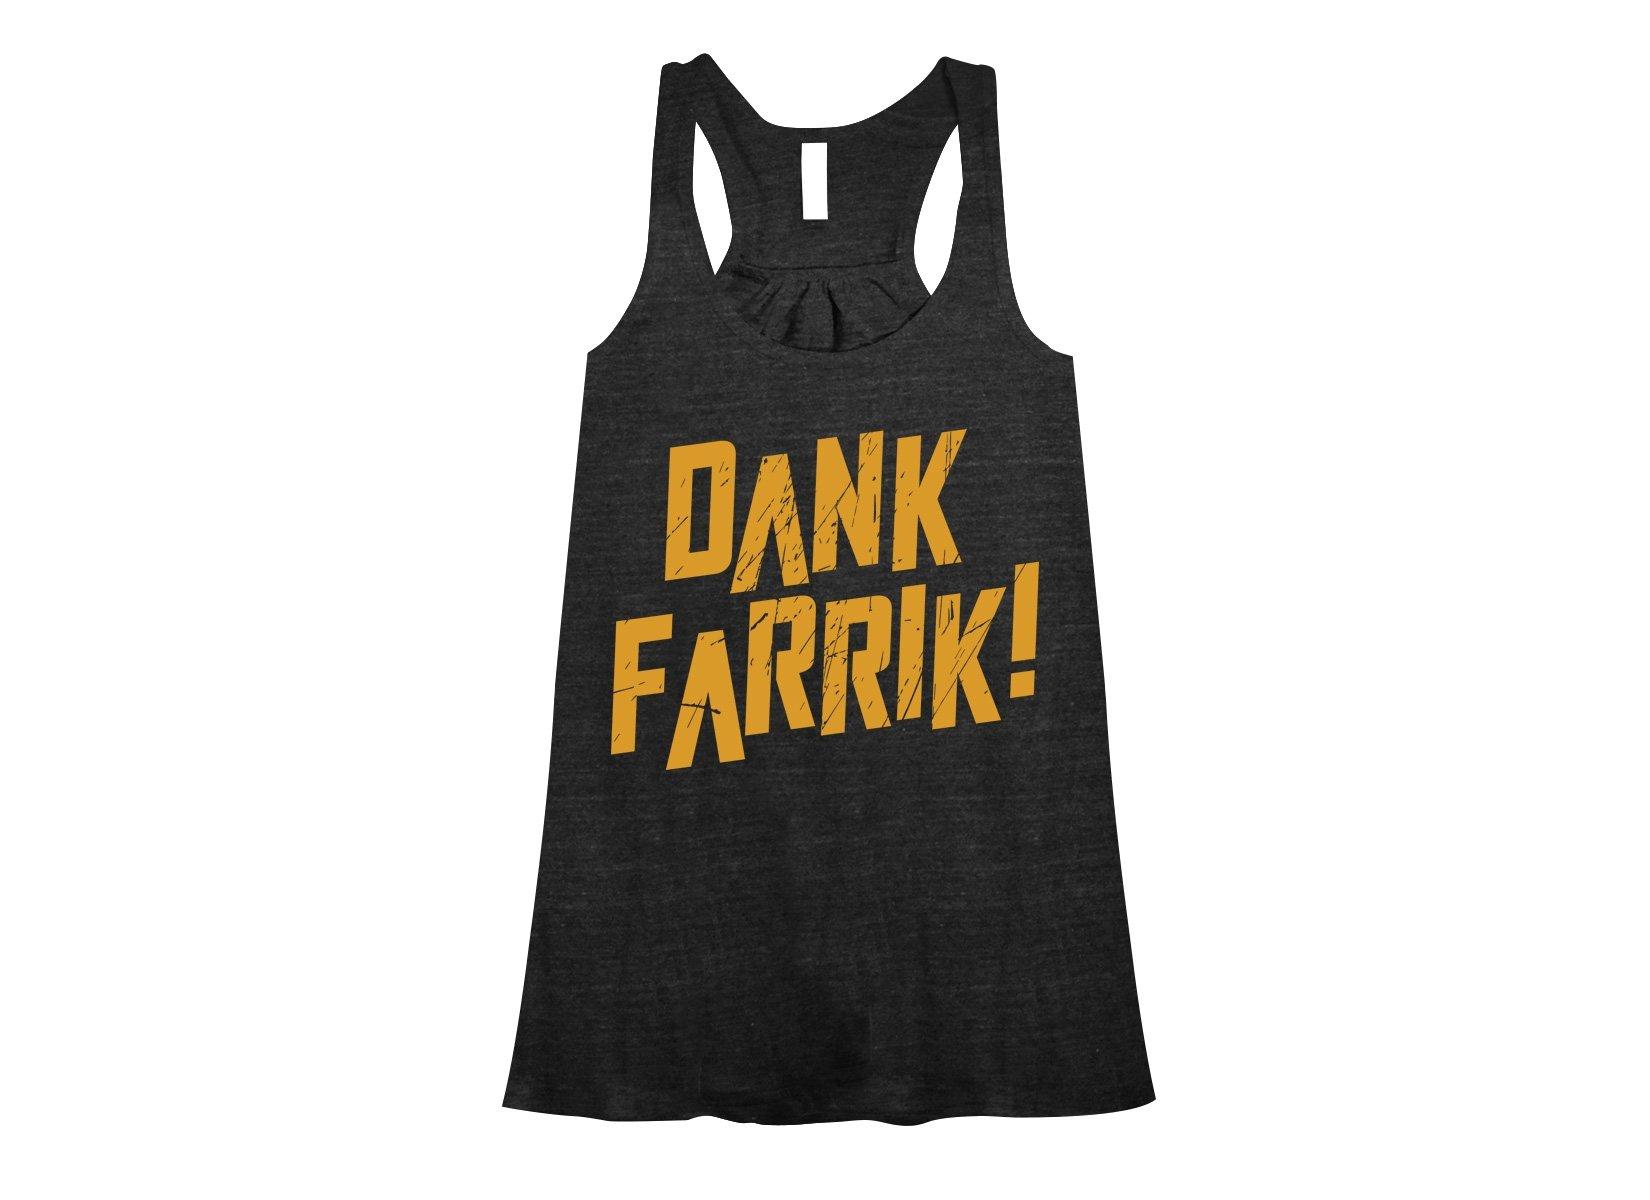 Dank Farrik! on Womens Tanks T-Shirt